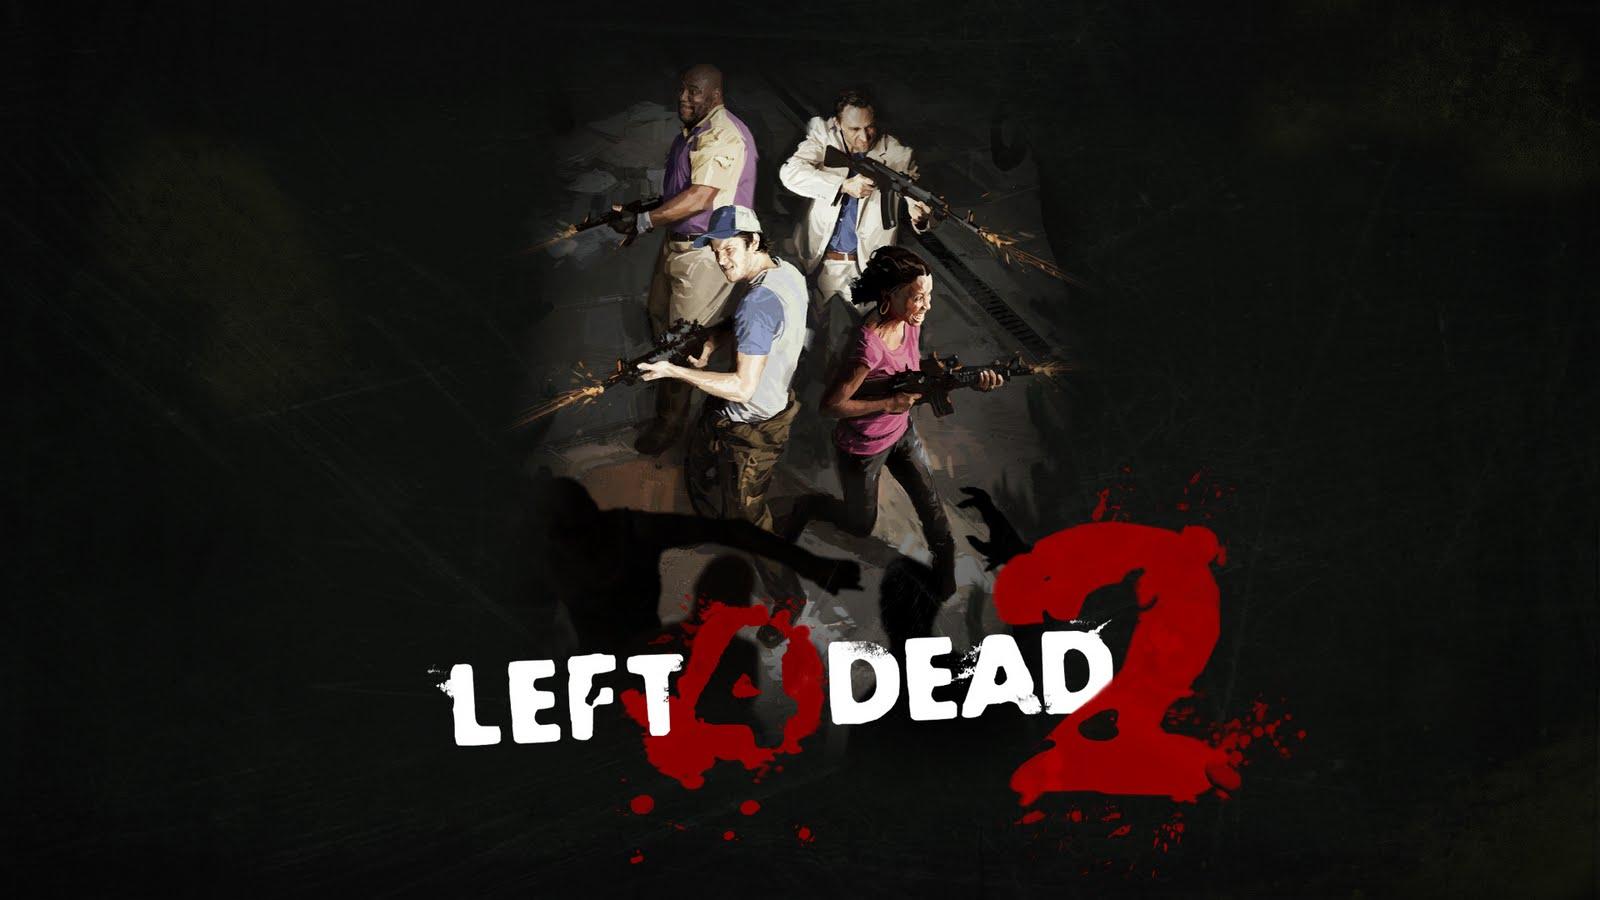 52+] Left 4 Dead 2 Wallpaper on WallpaperSafari